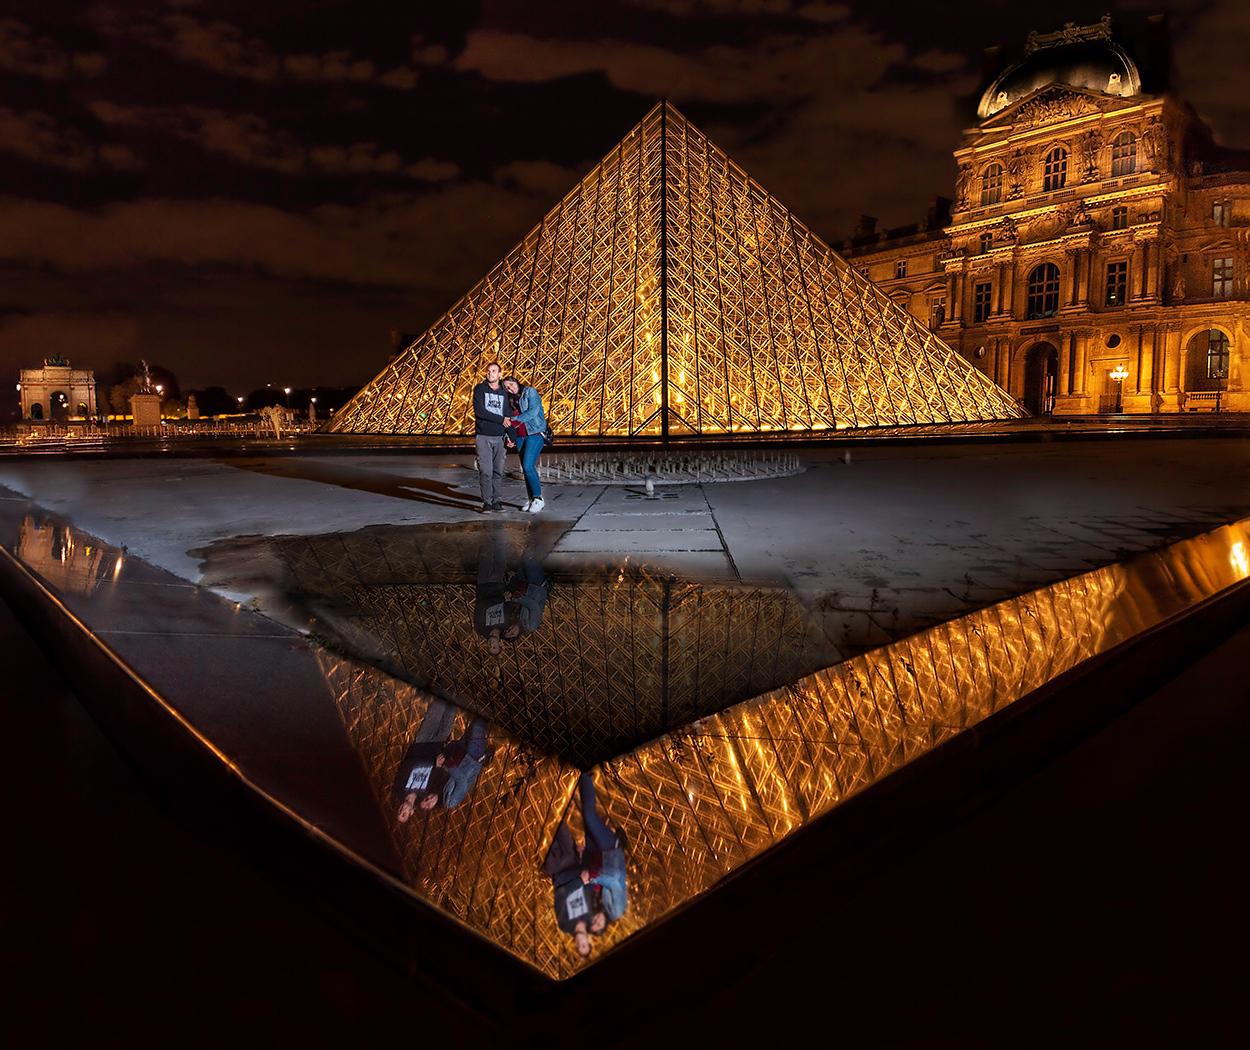 paris-louvre-reflejos